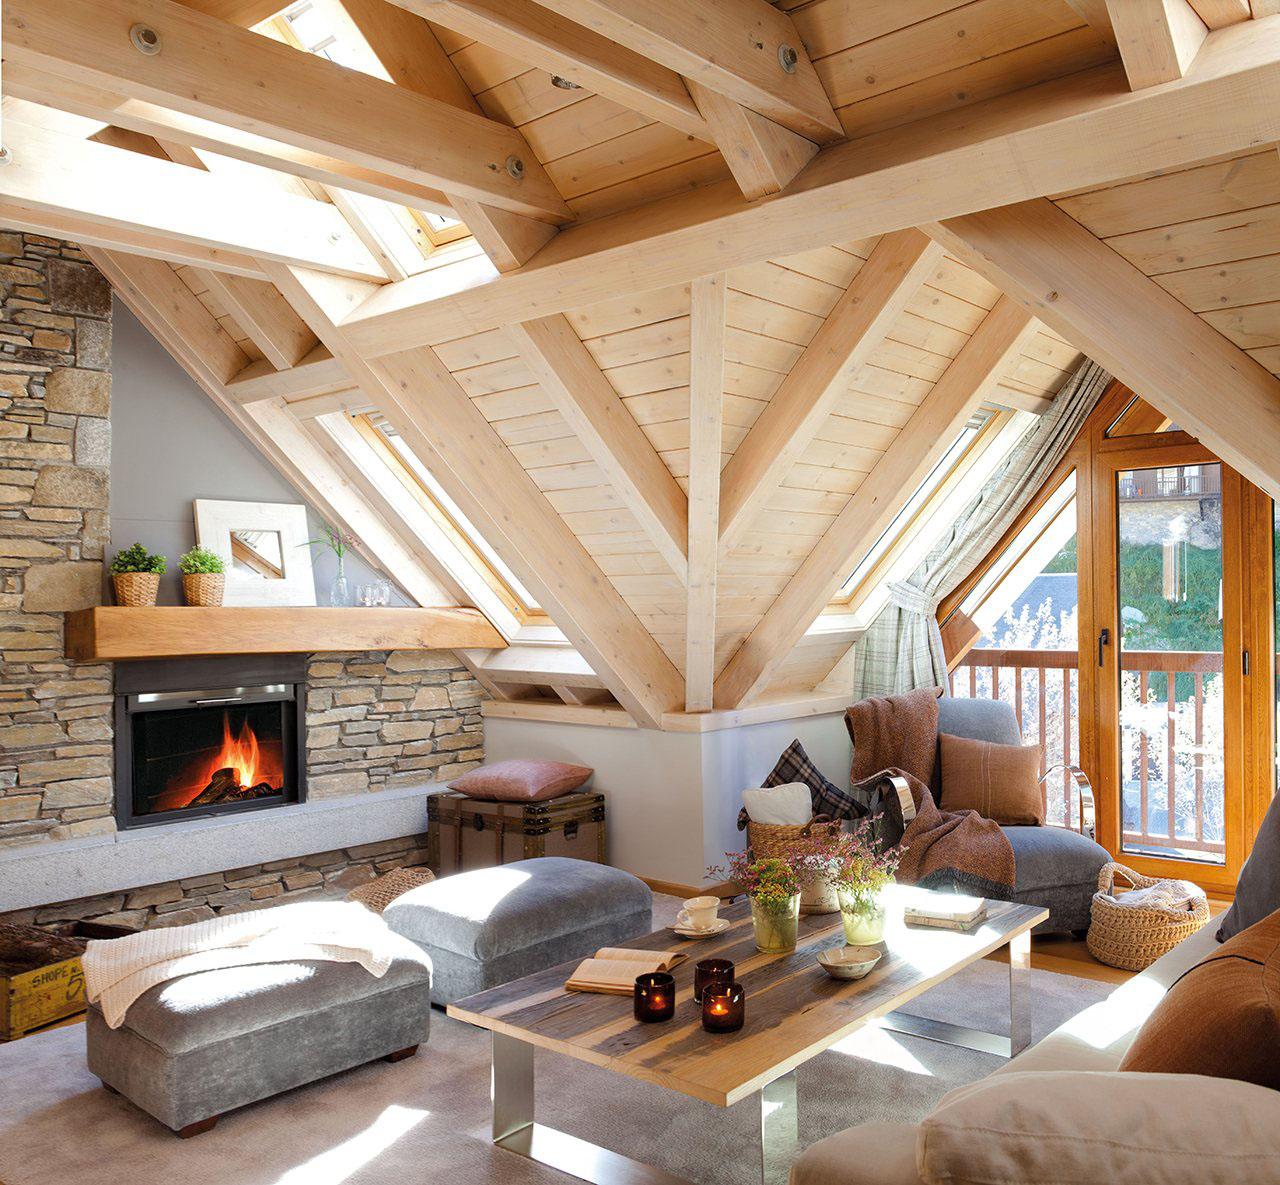 Cozy Rustic Mountain Retreat With A Contemporary Twist  iDesignArch  Interior Design